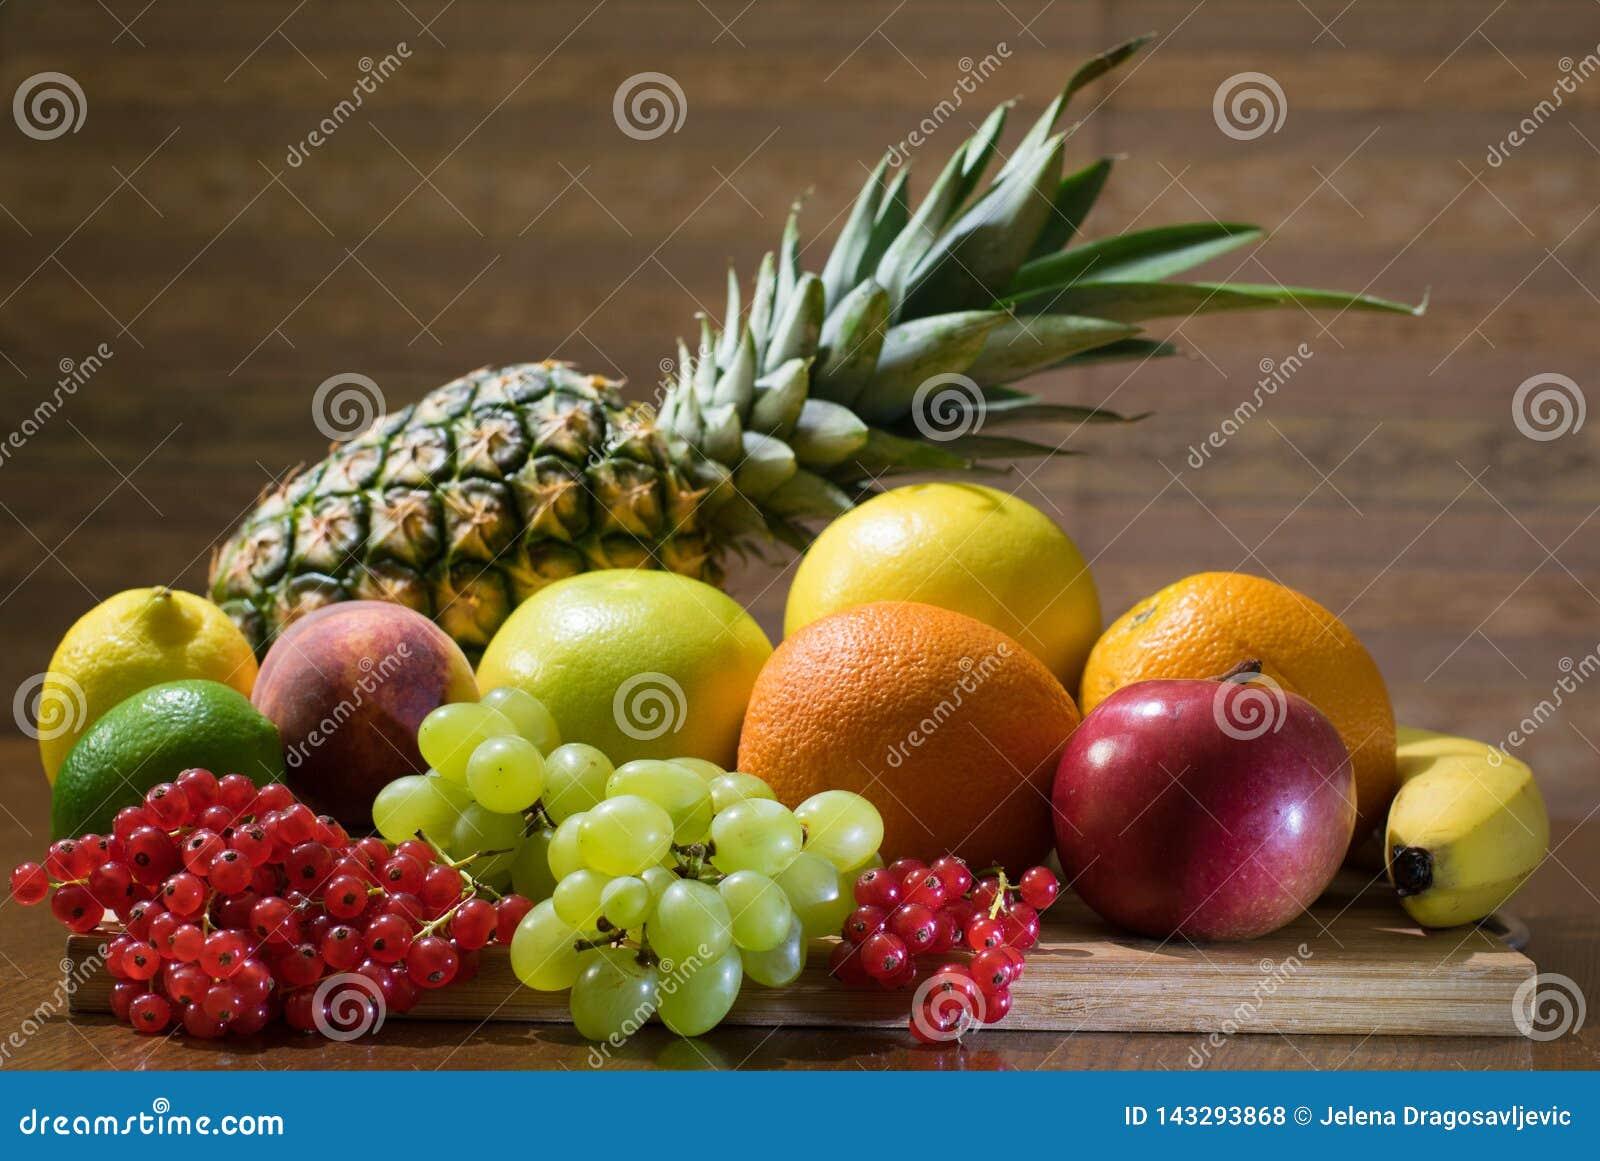 Olika sorter av frukter på träbrädet på tabellen med brun bakgrund